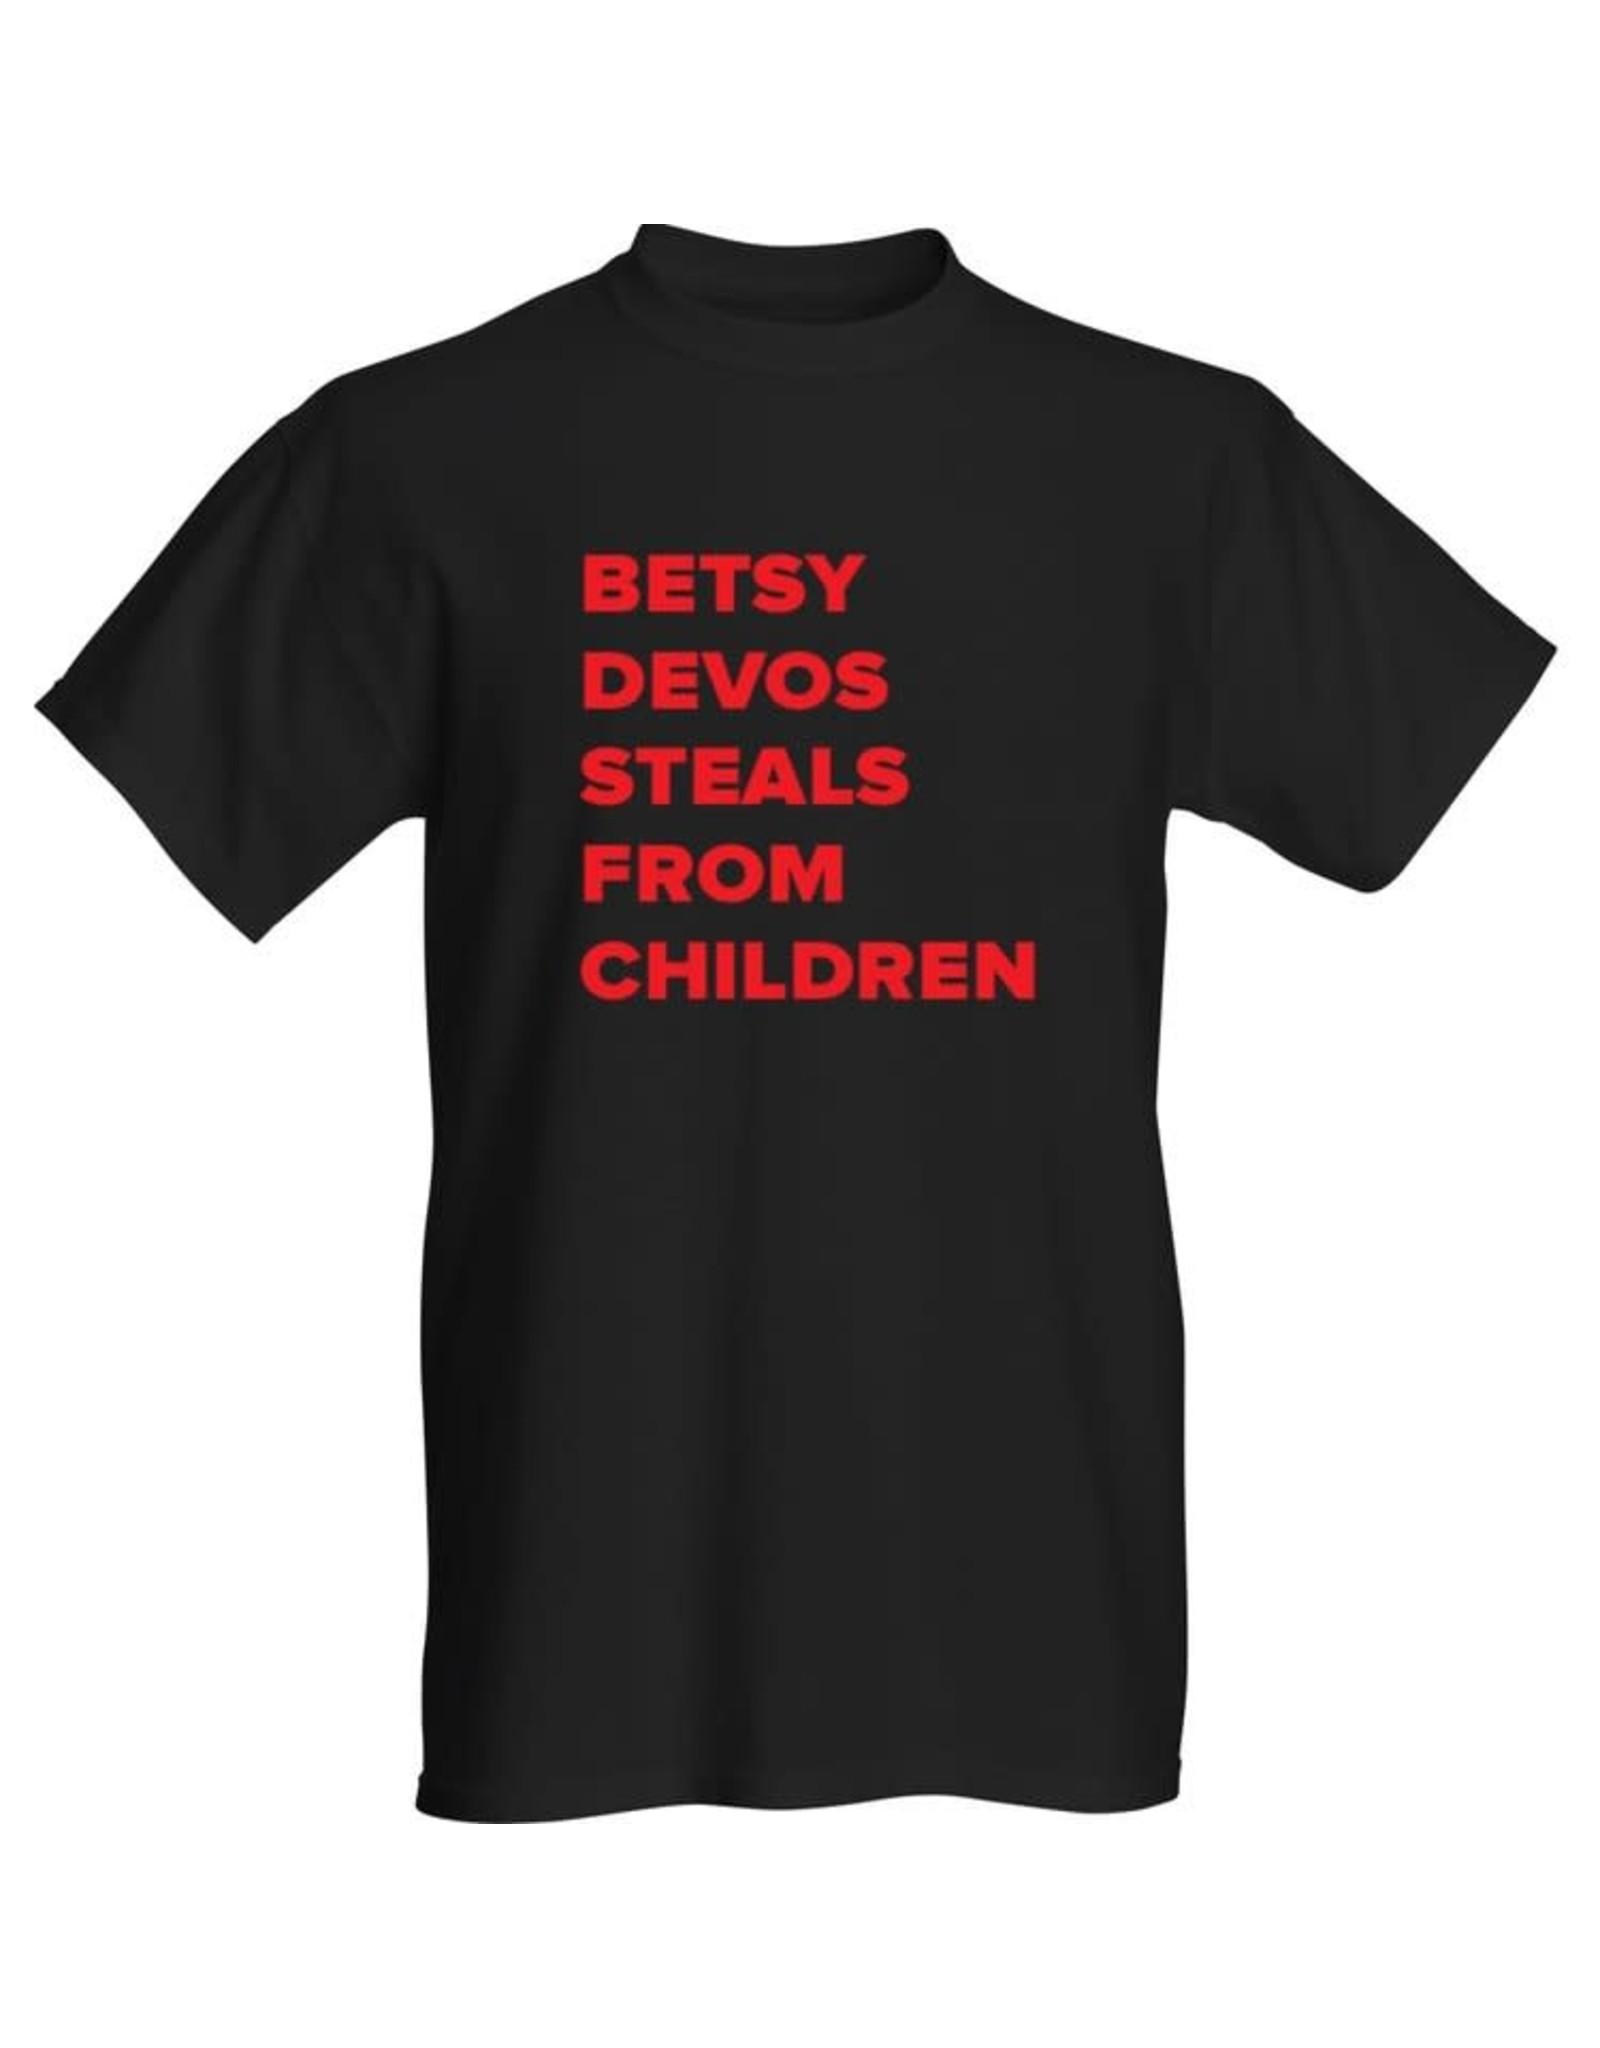 T-Shirt - Betsy Devos Steals From Children